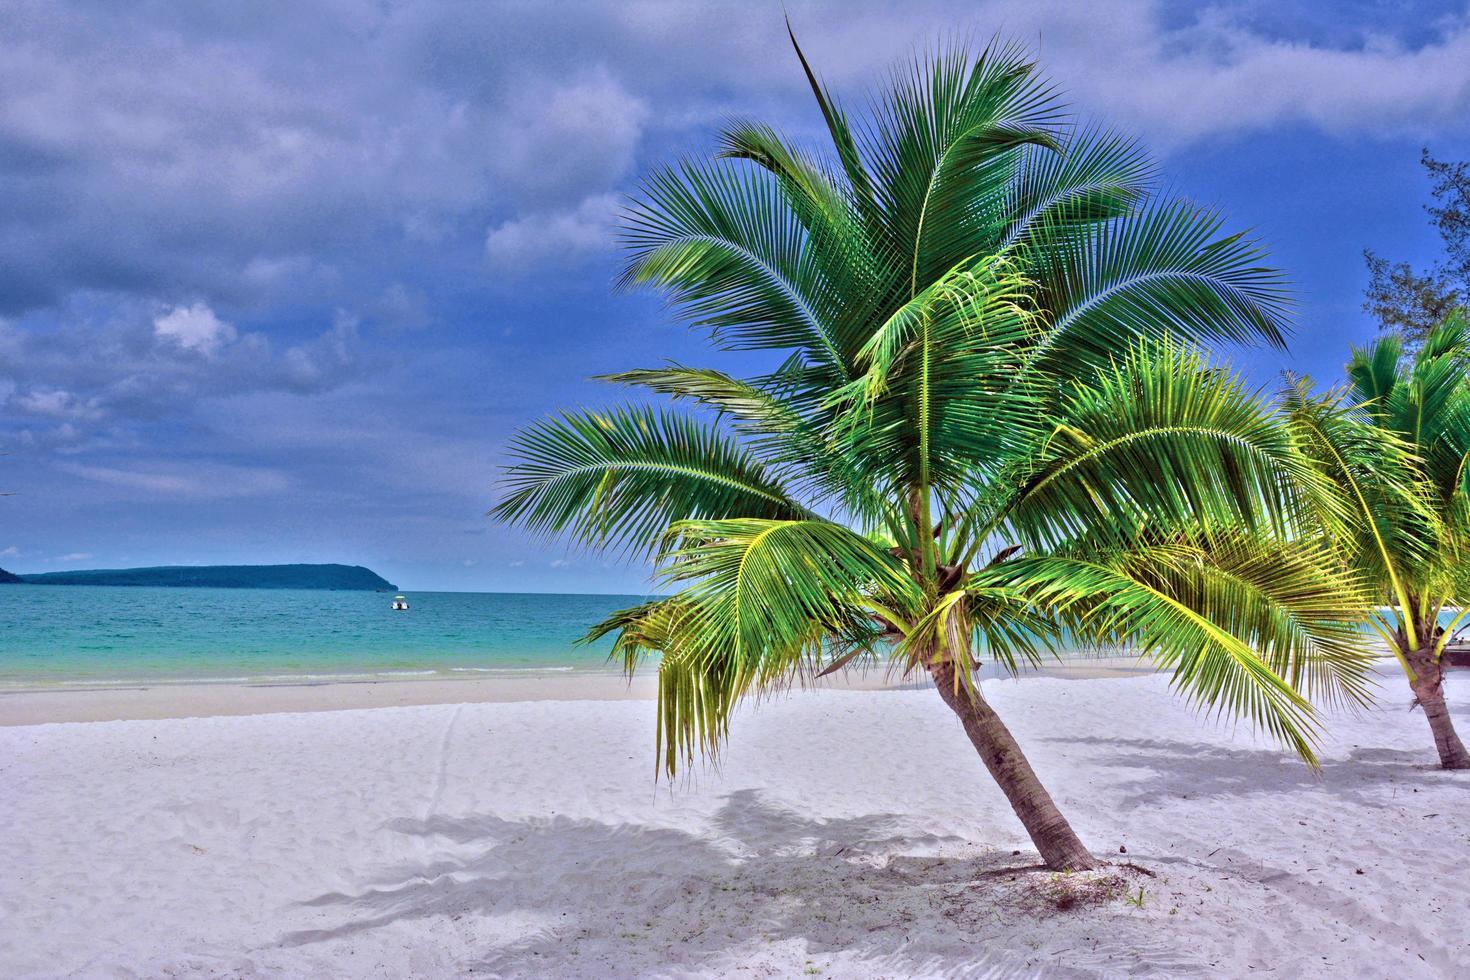 groene palmboom op wit zandstrand foto